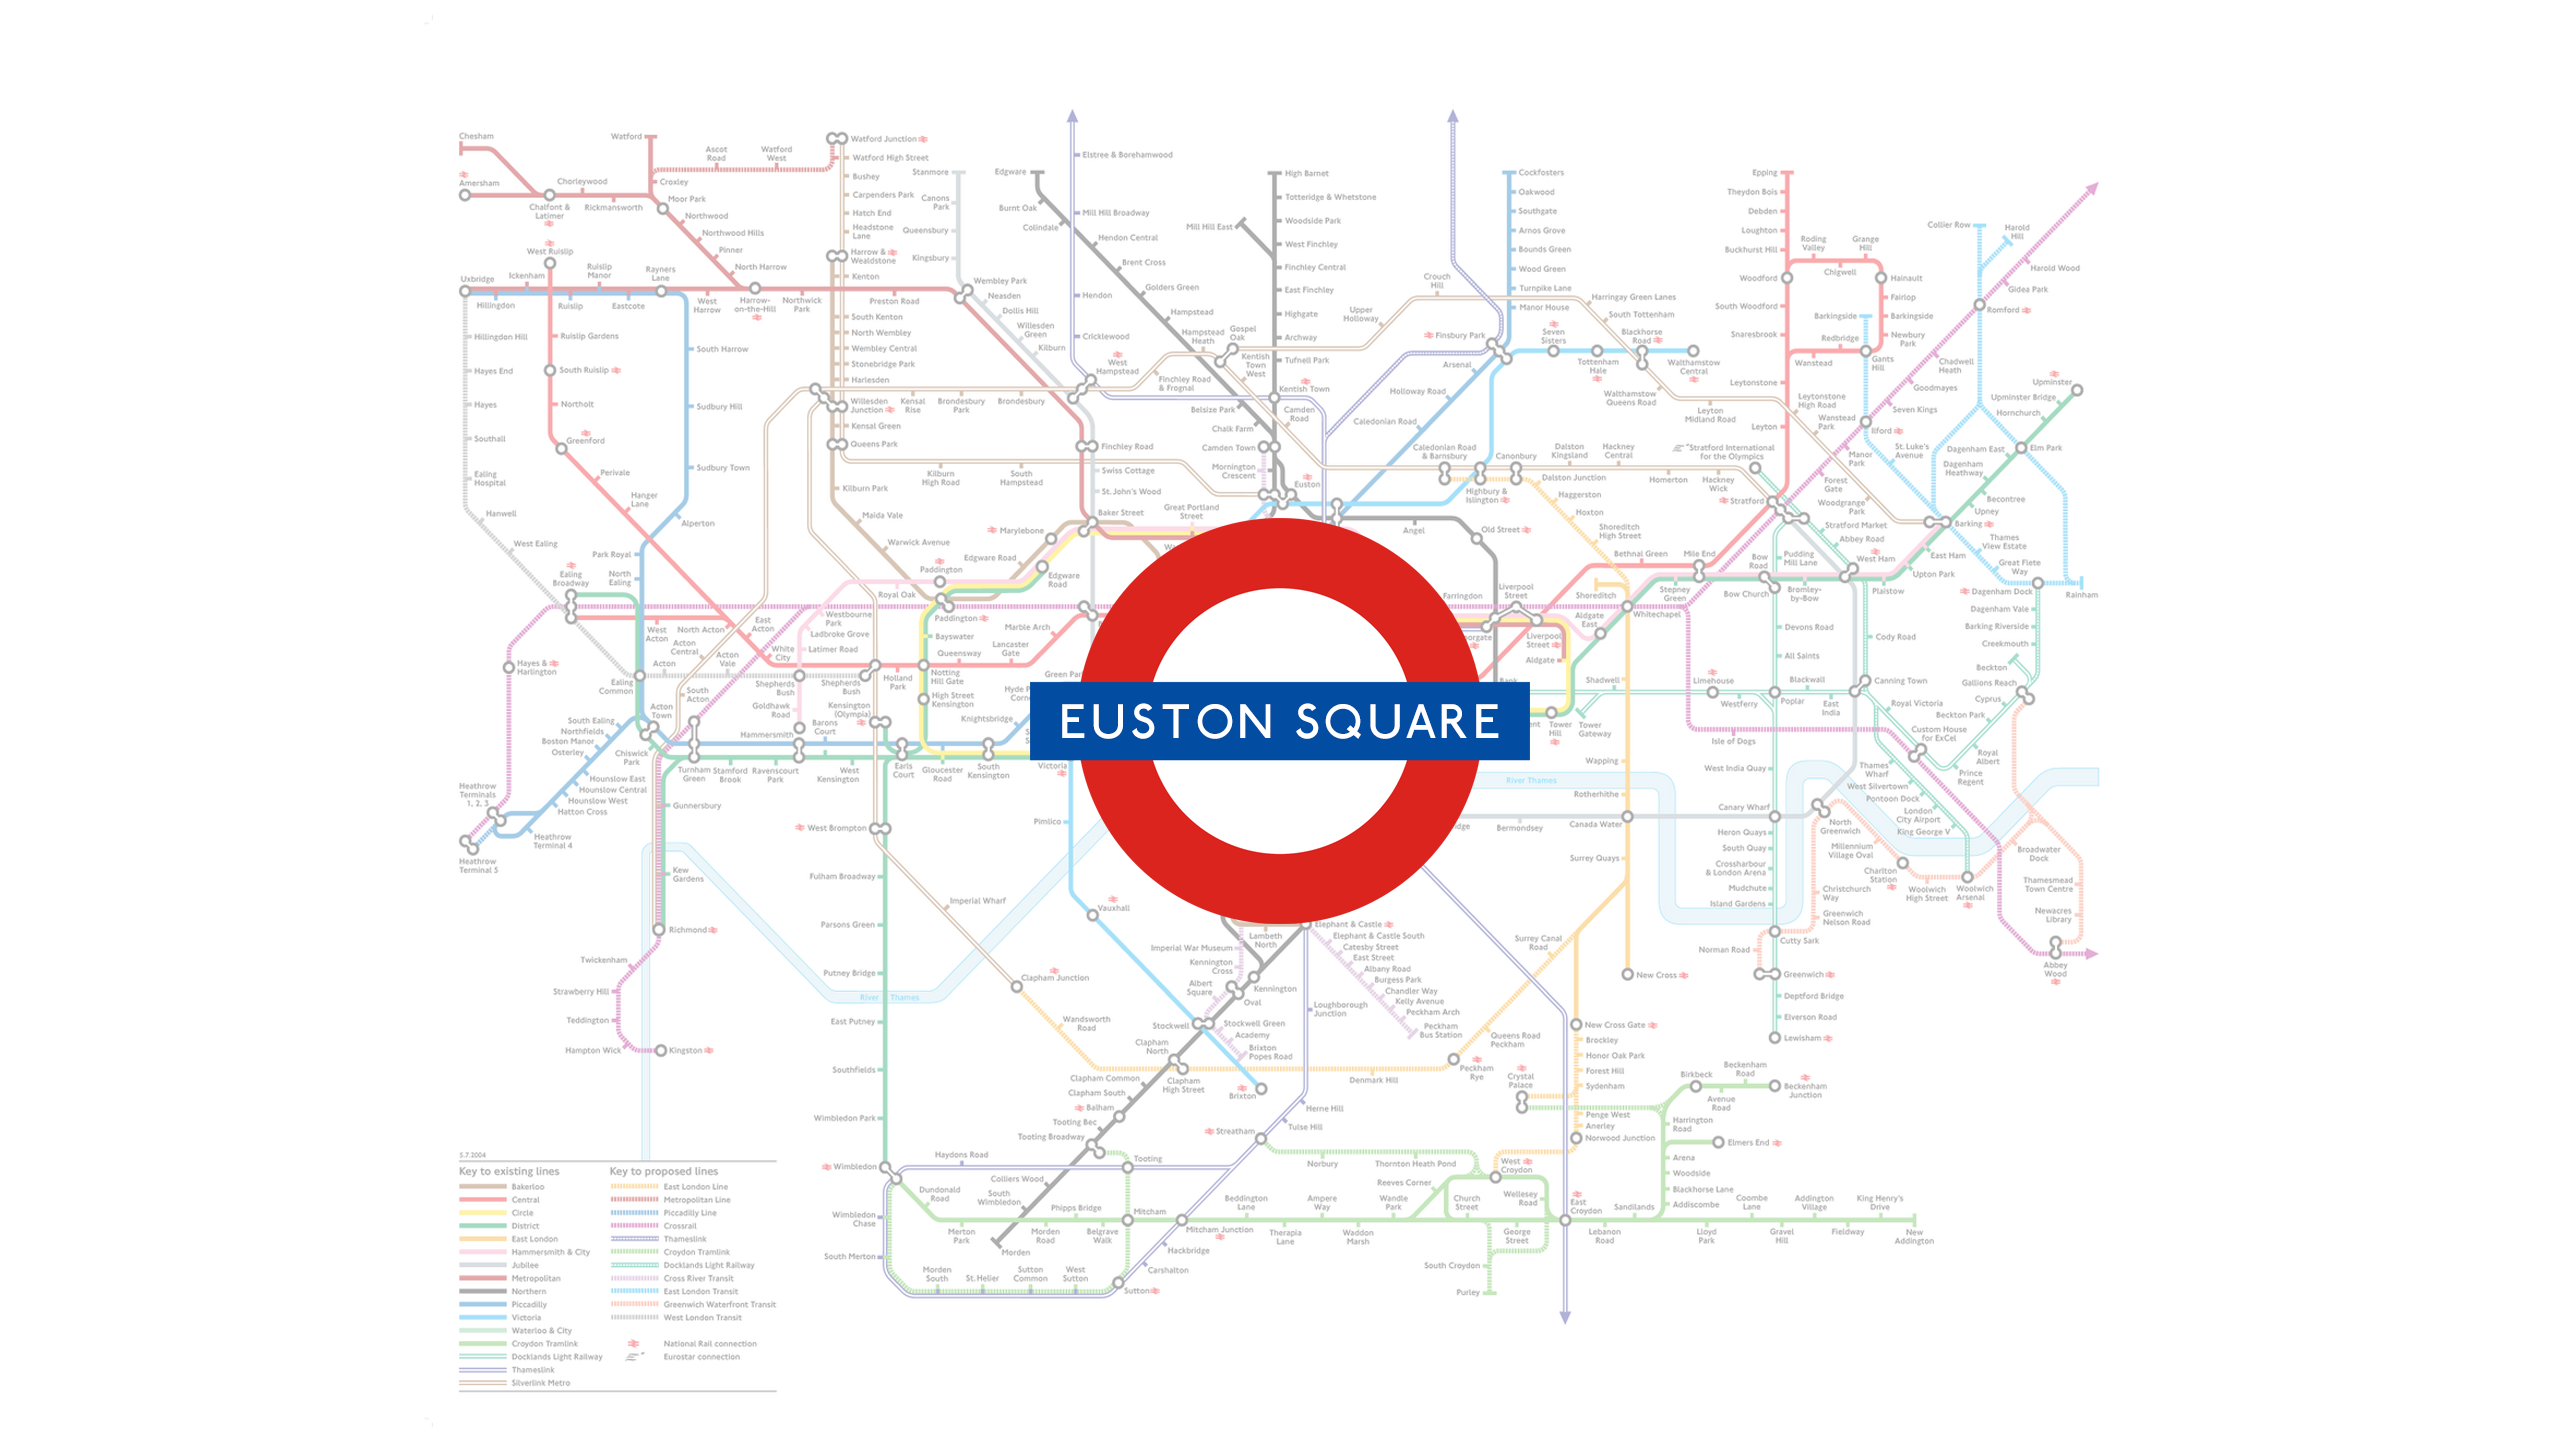 Euston Square (Map)